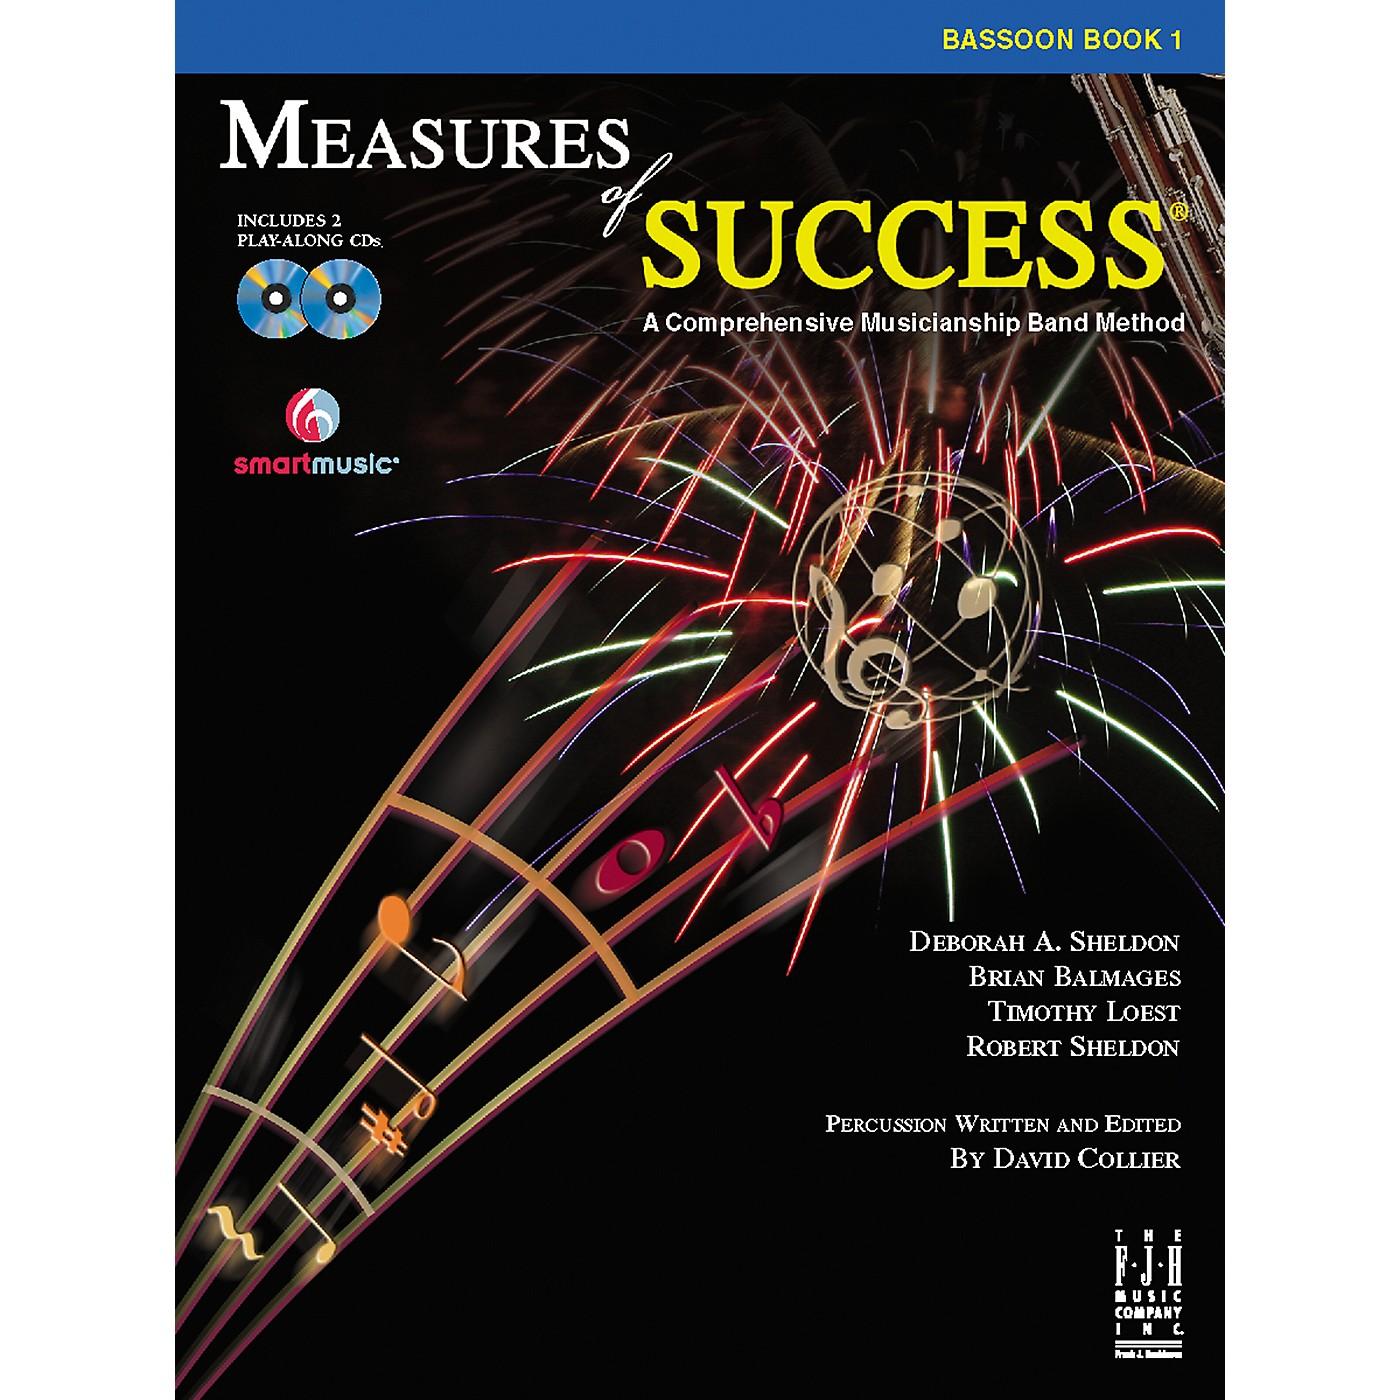 FJH Music Measures of Success Bassoon Book 1 thumbnail